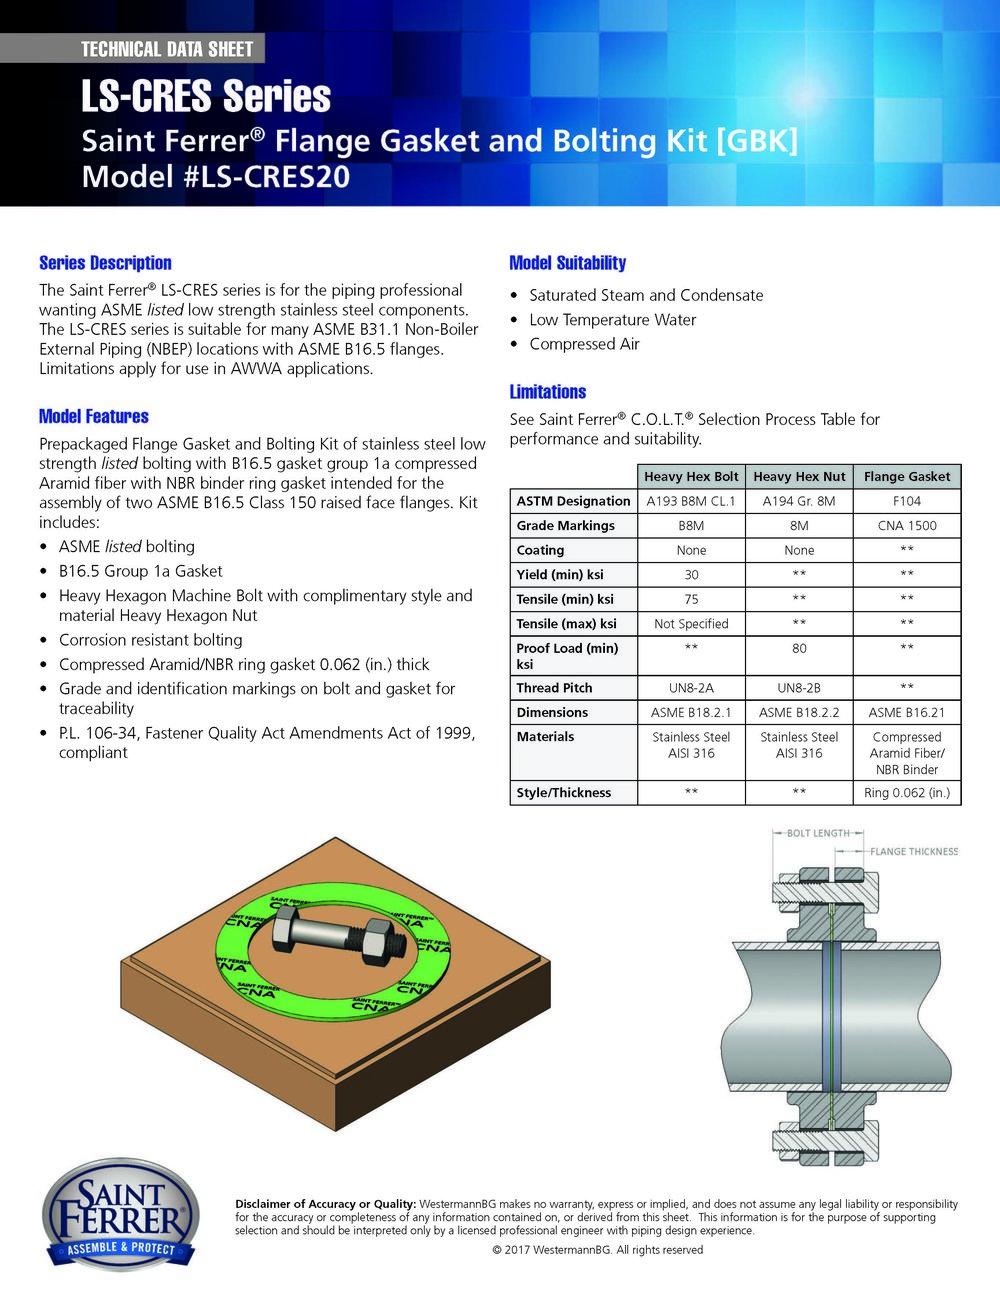 SF_Data_Sheet_LS-CRES_Series_LS-CRES20.jpg